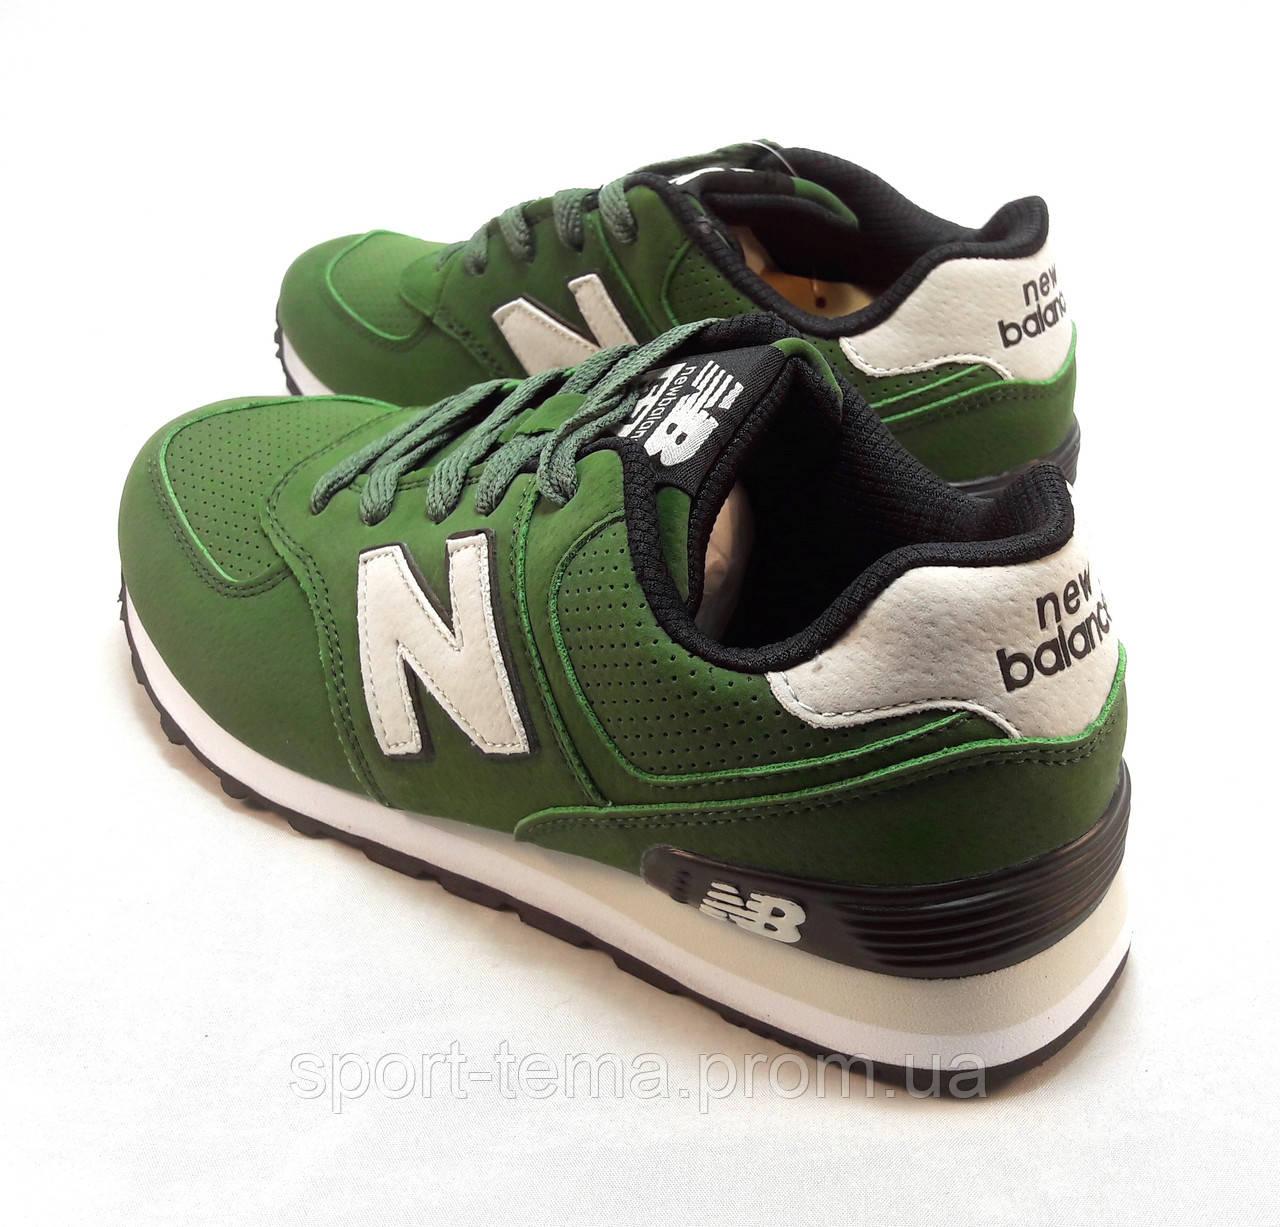 d75ea8a686e7 Кроссовки New Balance 574 замшевые зеленые унисекс (р.36,37,38,39,40 ...